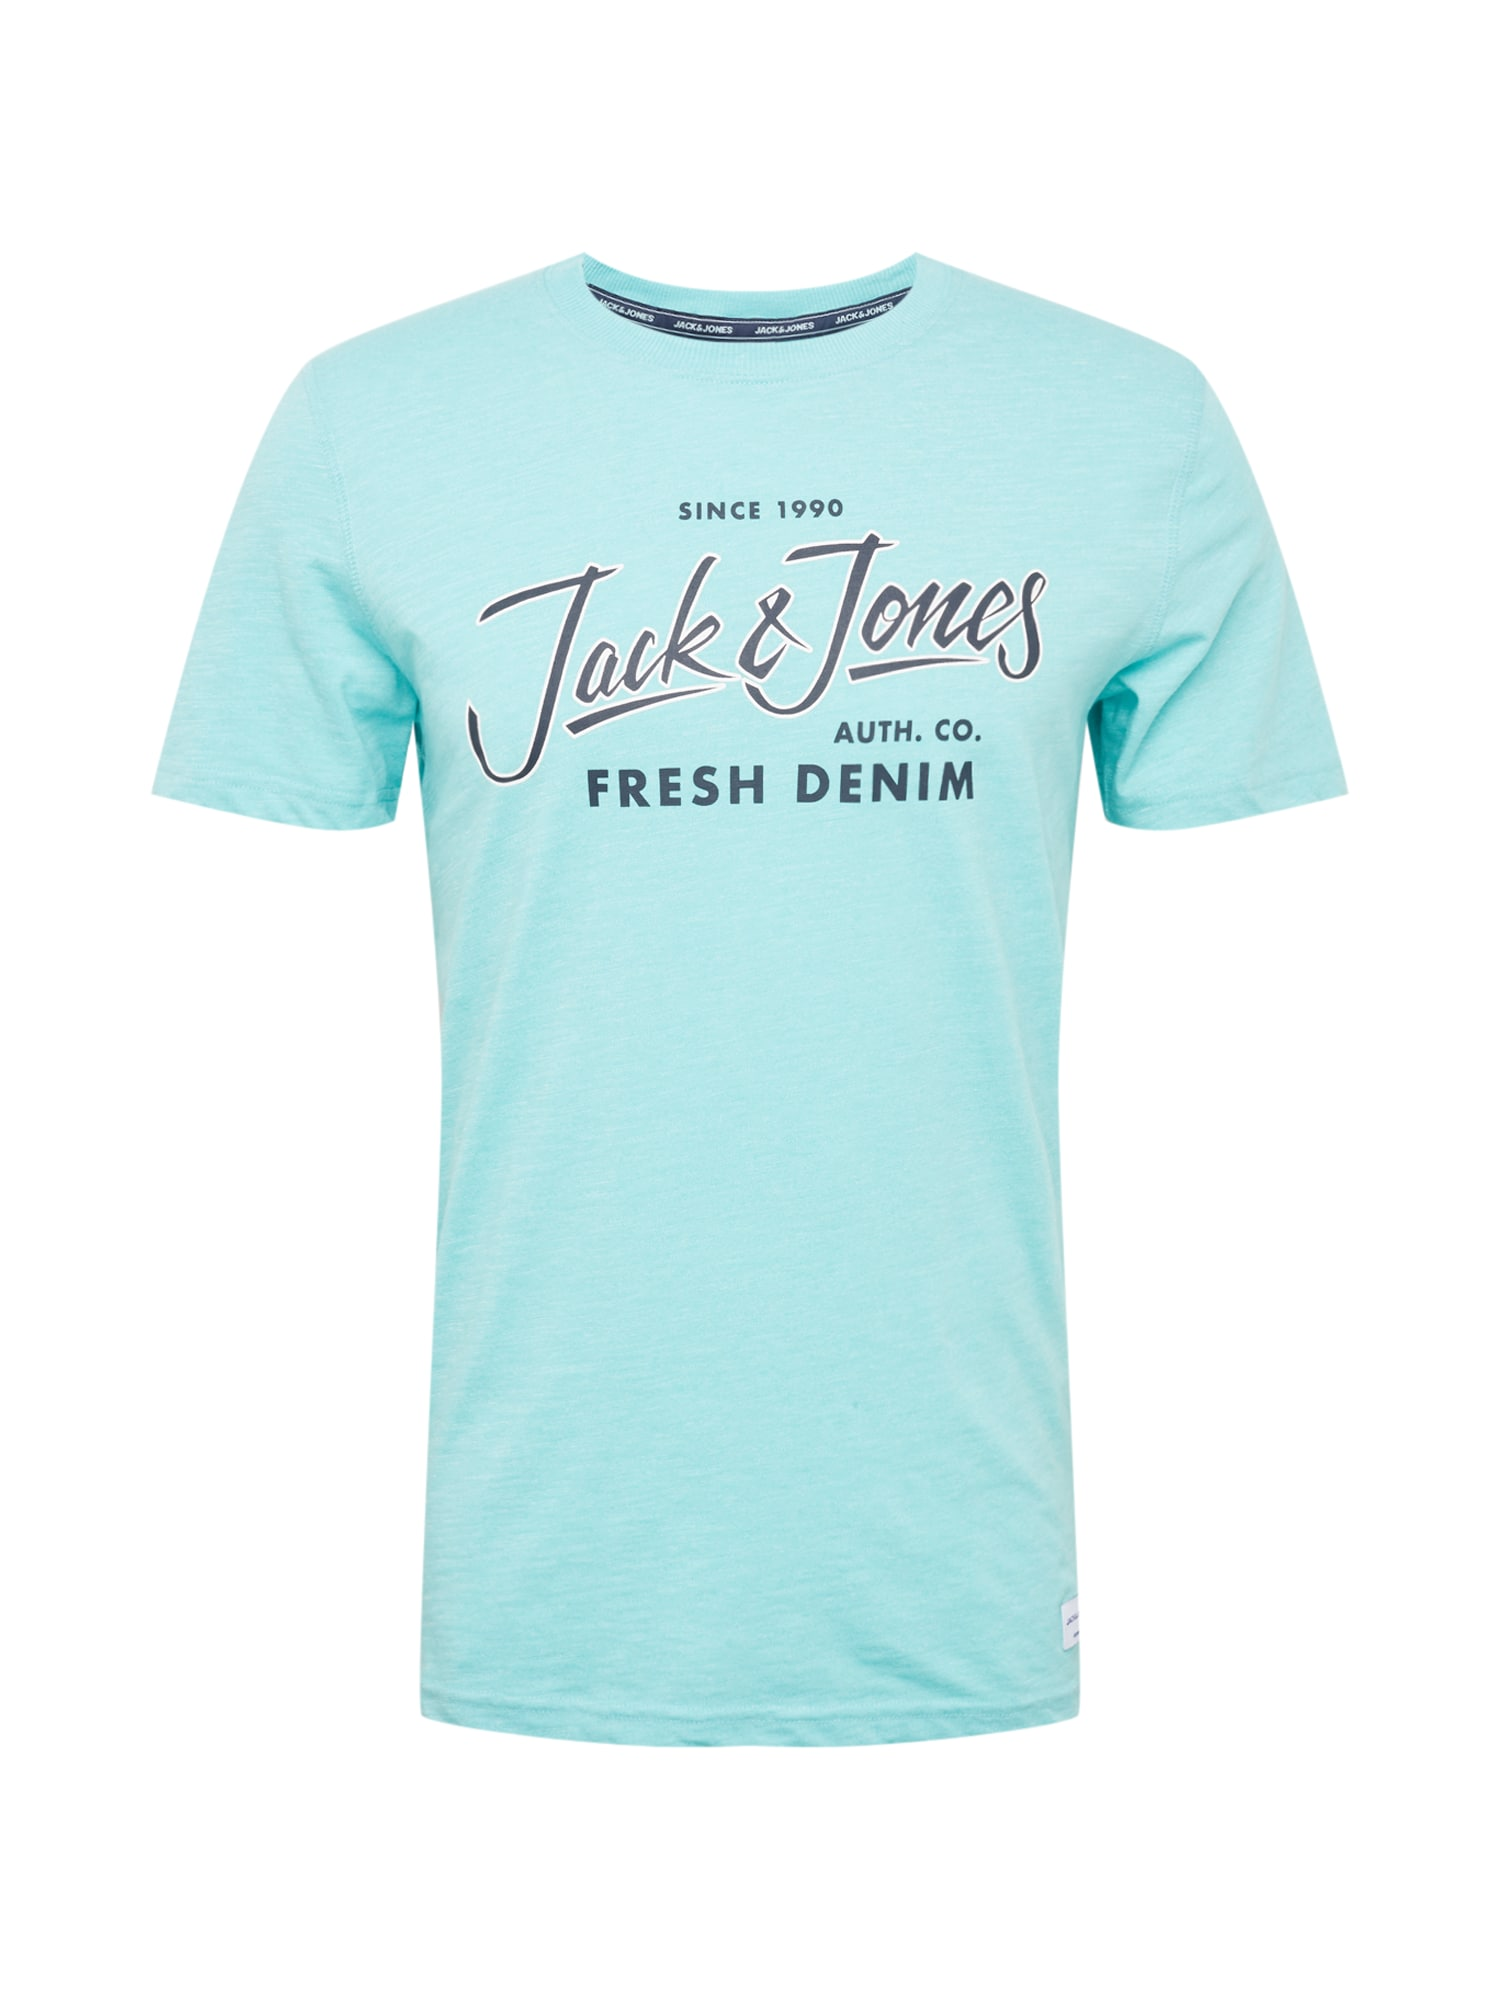 Tričko BEAMS TEE tyrkysová tmavě modrá JACK & JONES